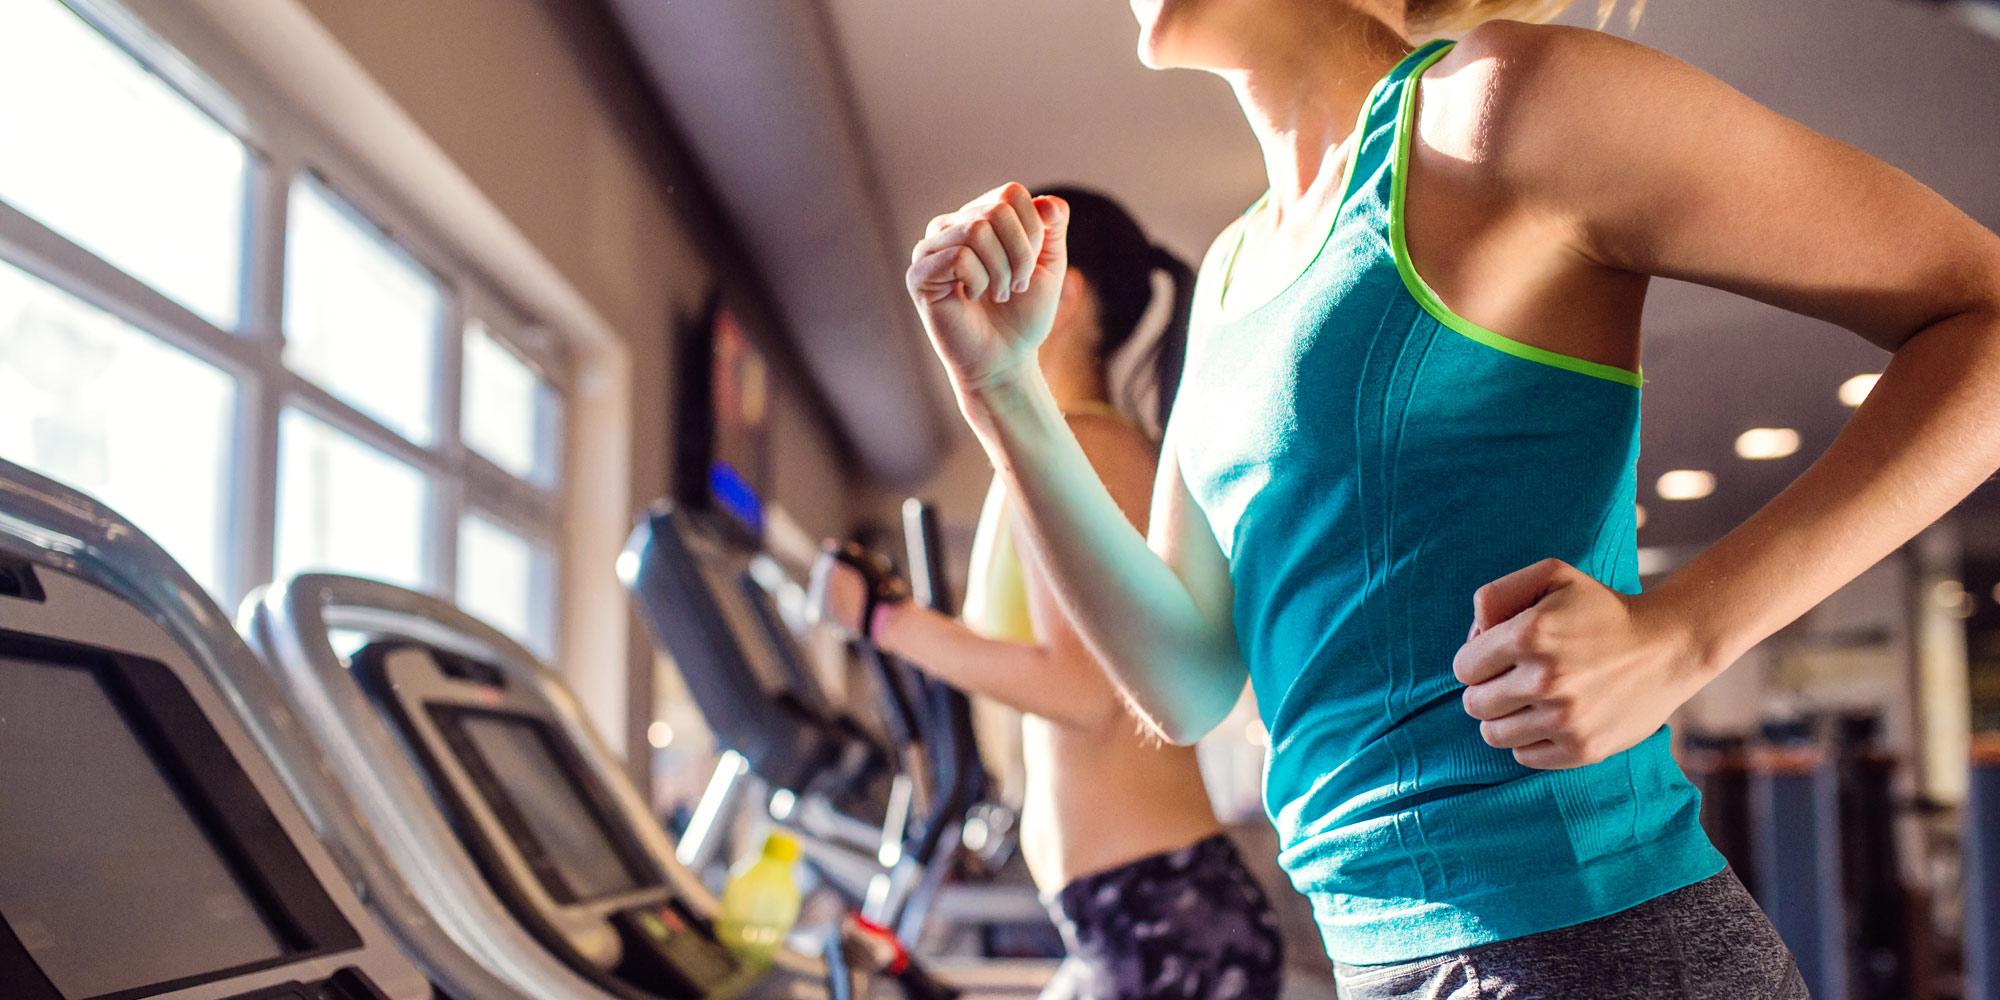 Frau trainiert - pro-fitness-discounter